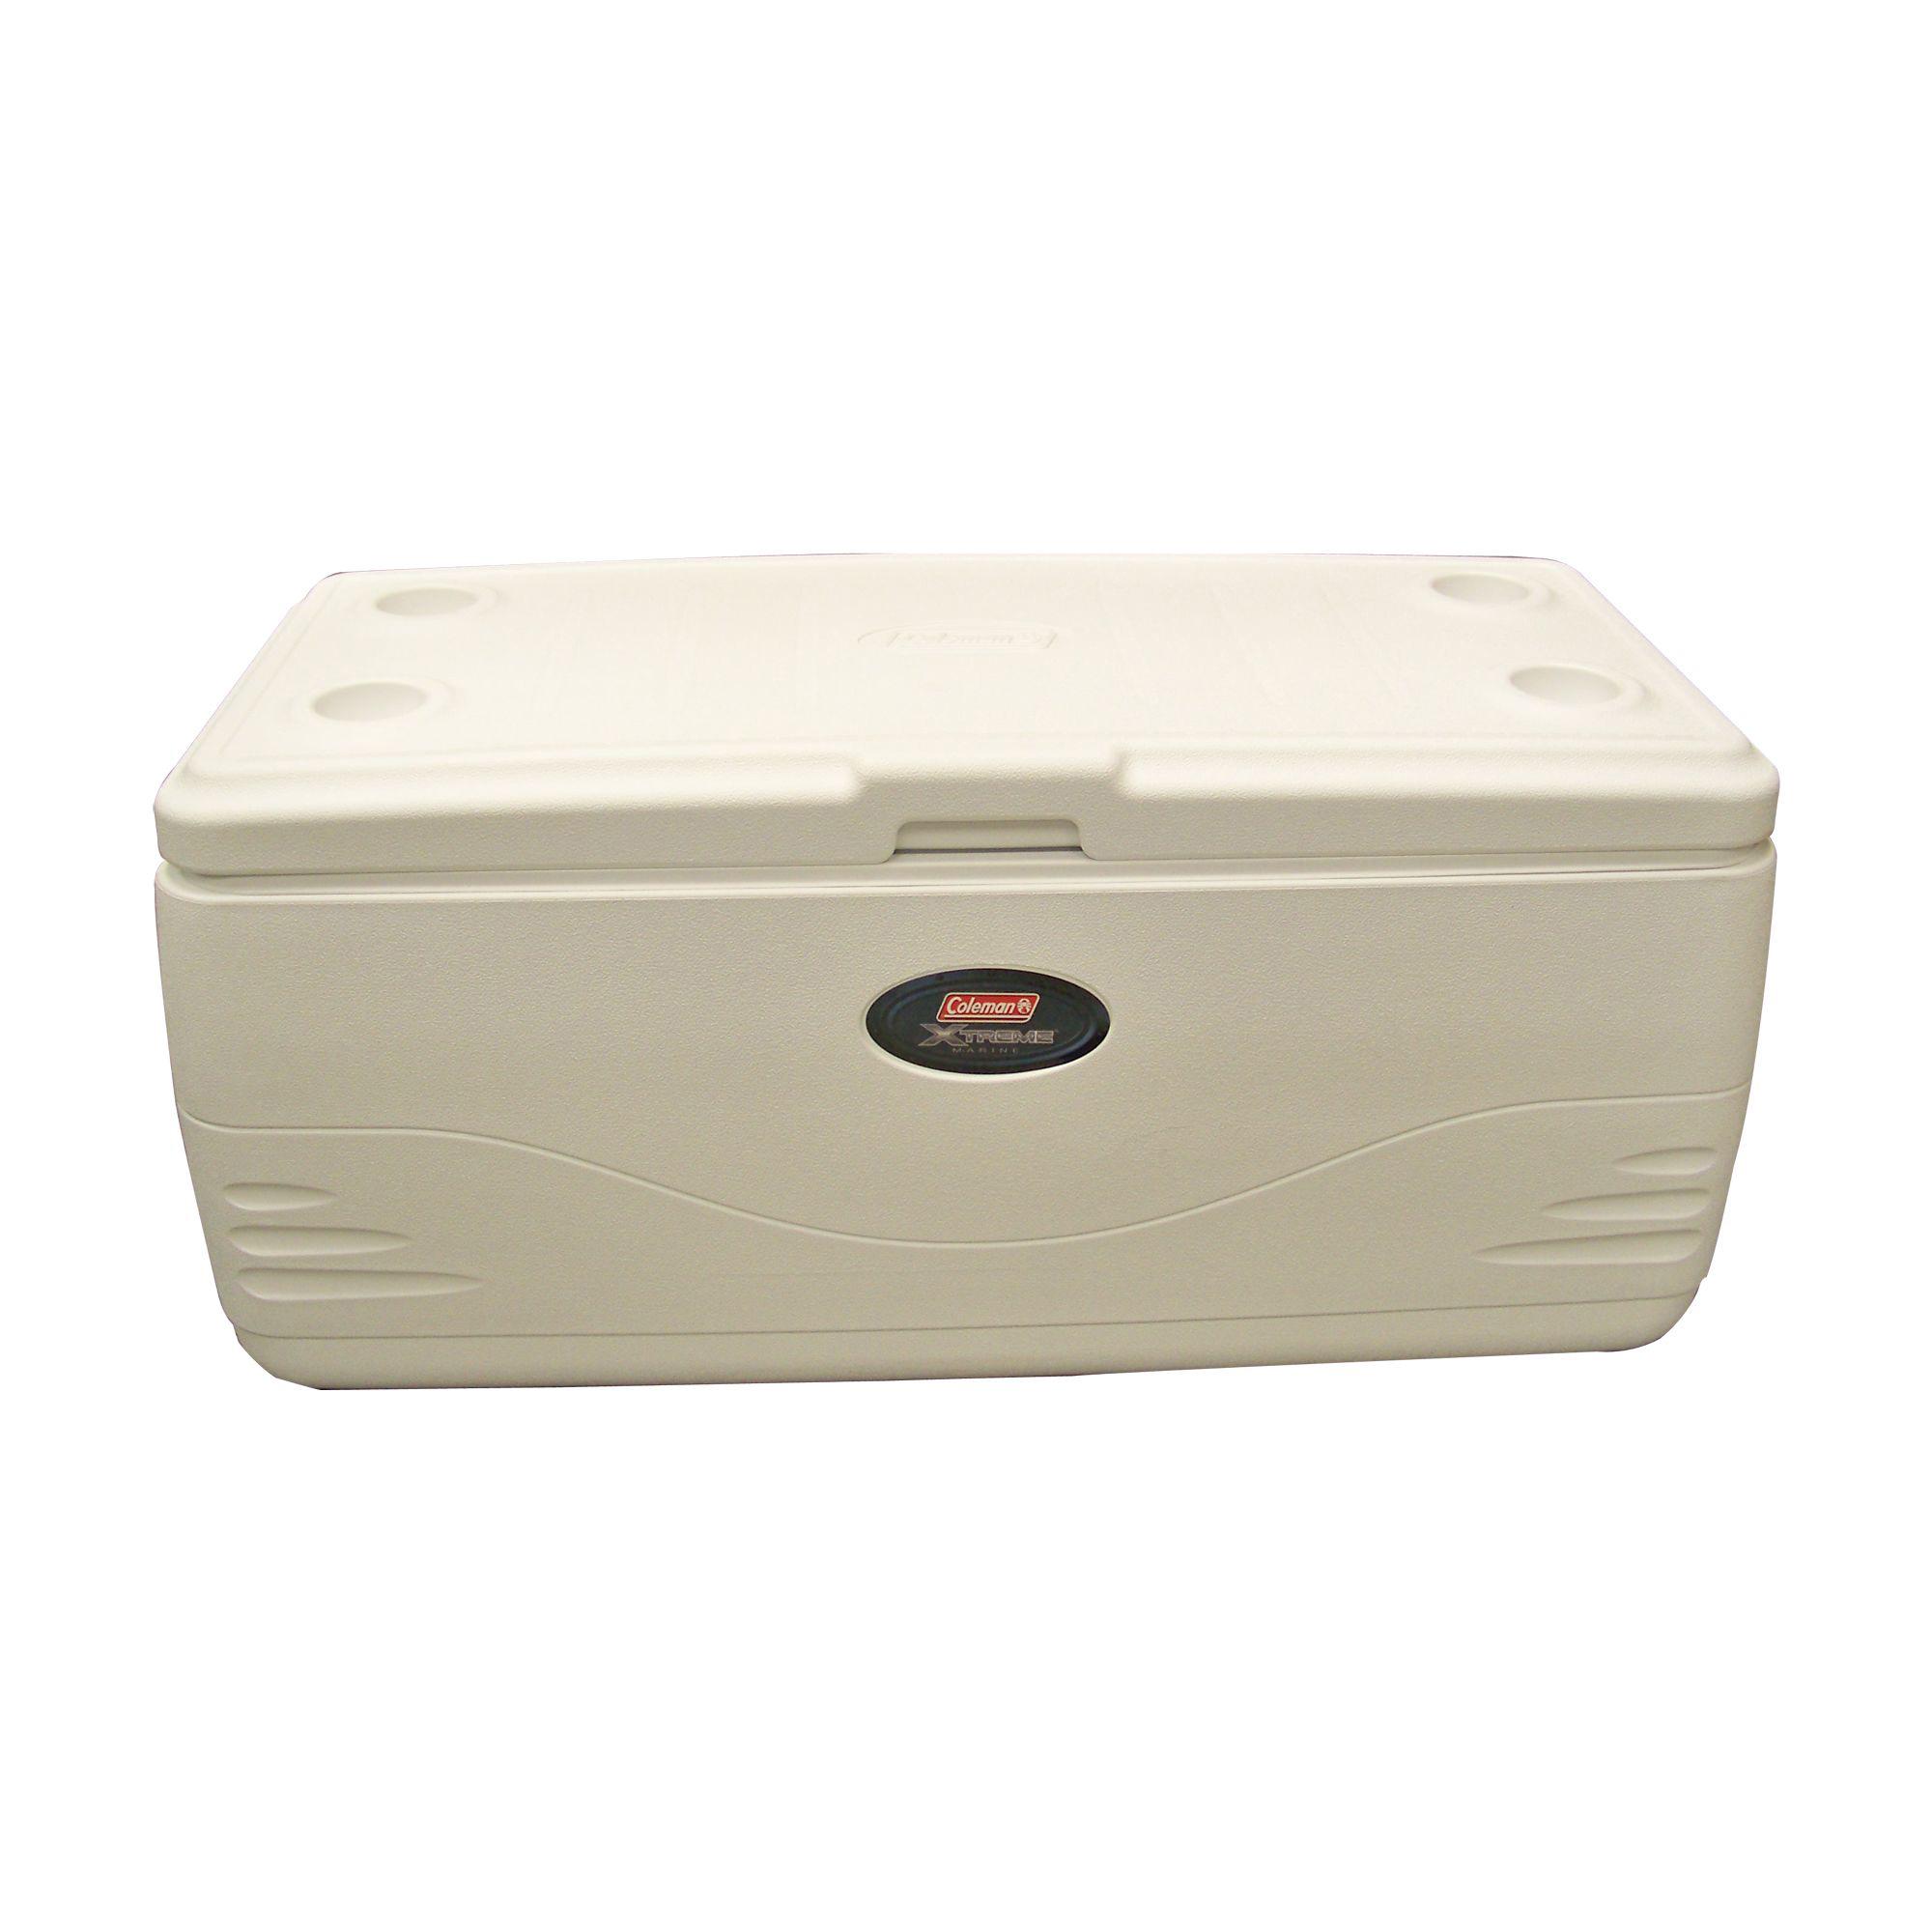 Coleman Xtreme Marine 150-Quart Cooler